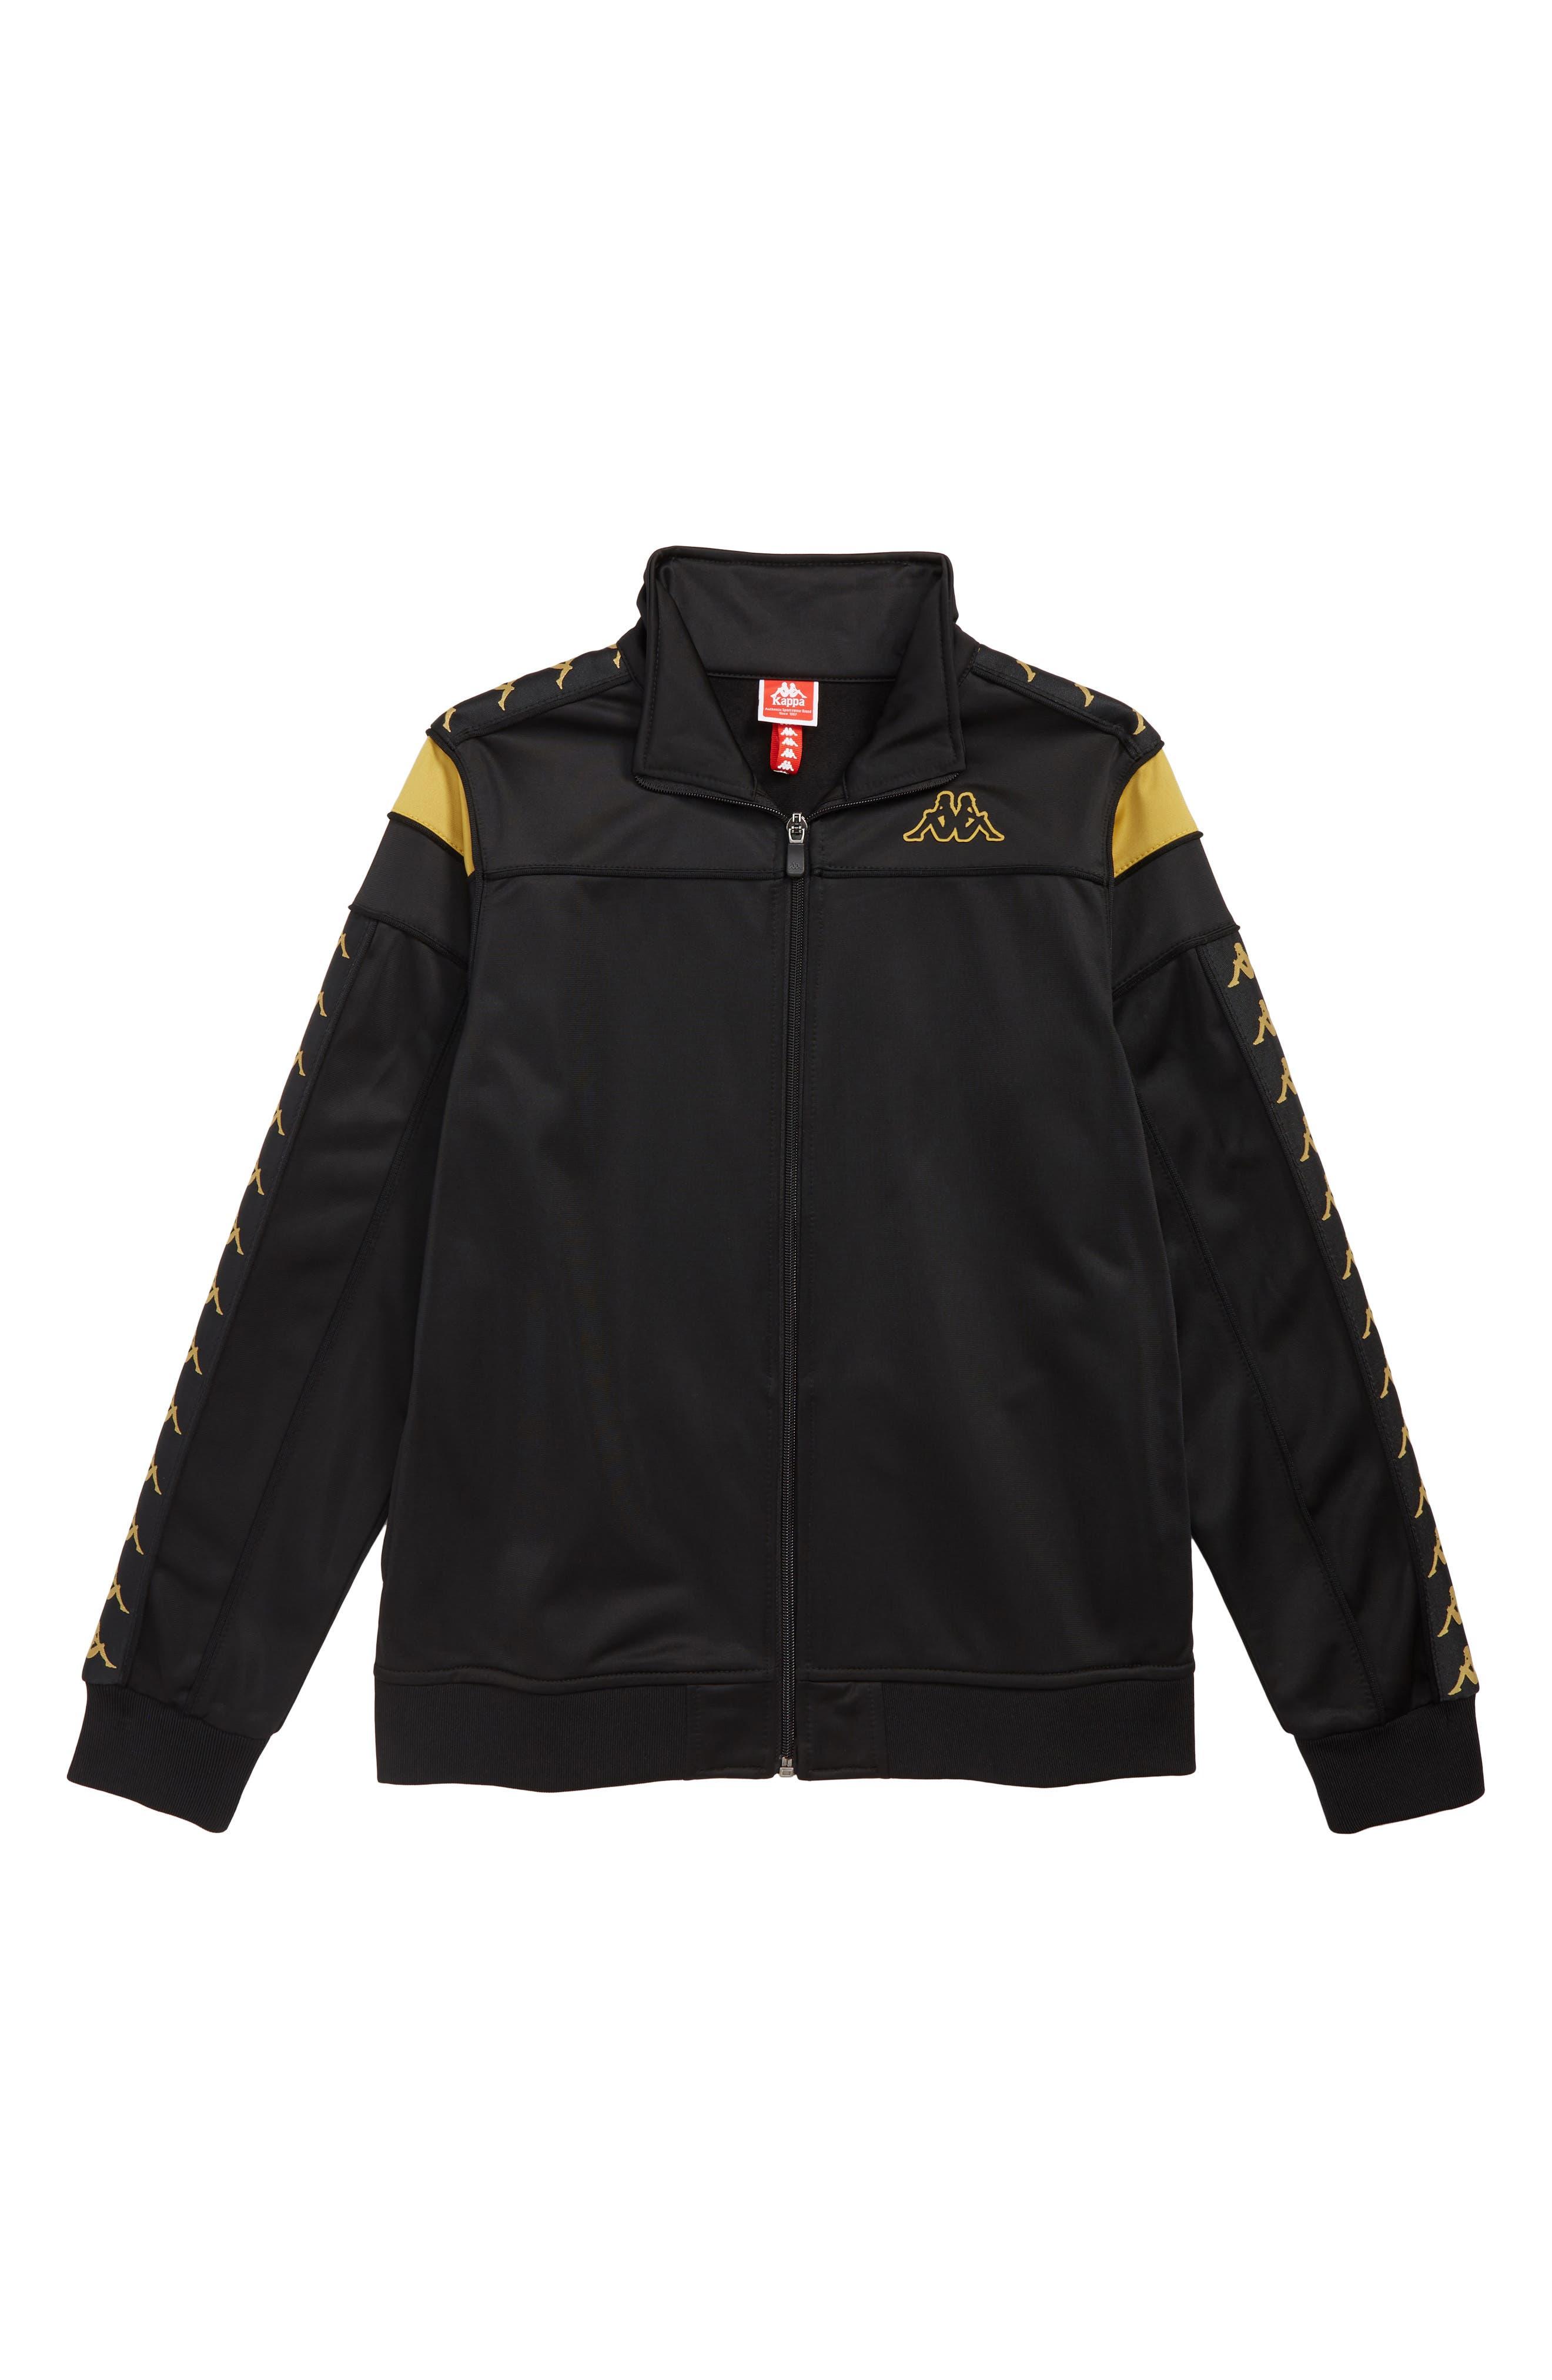 Banda Merez Slim Track Jacket,                             Main thumbnail 1, color,                             BLACK GOLD